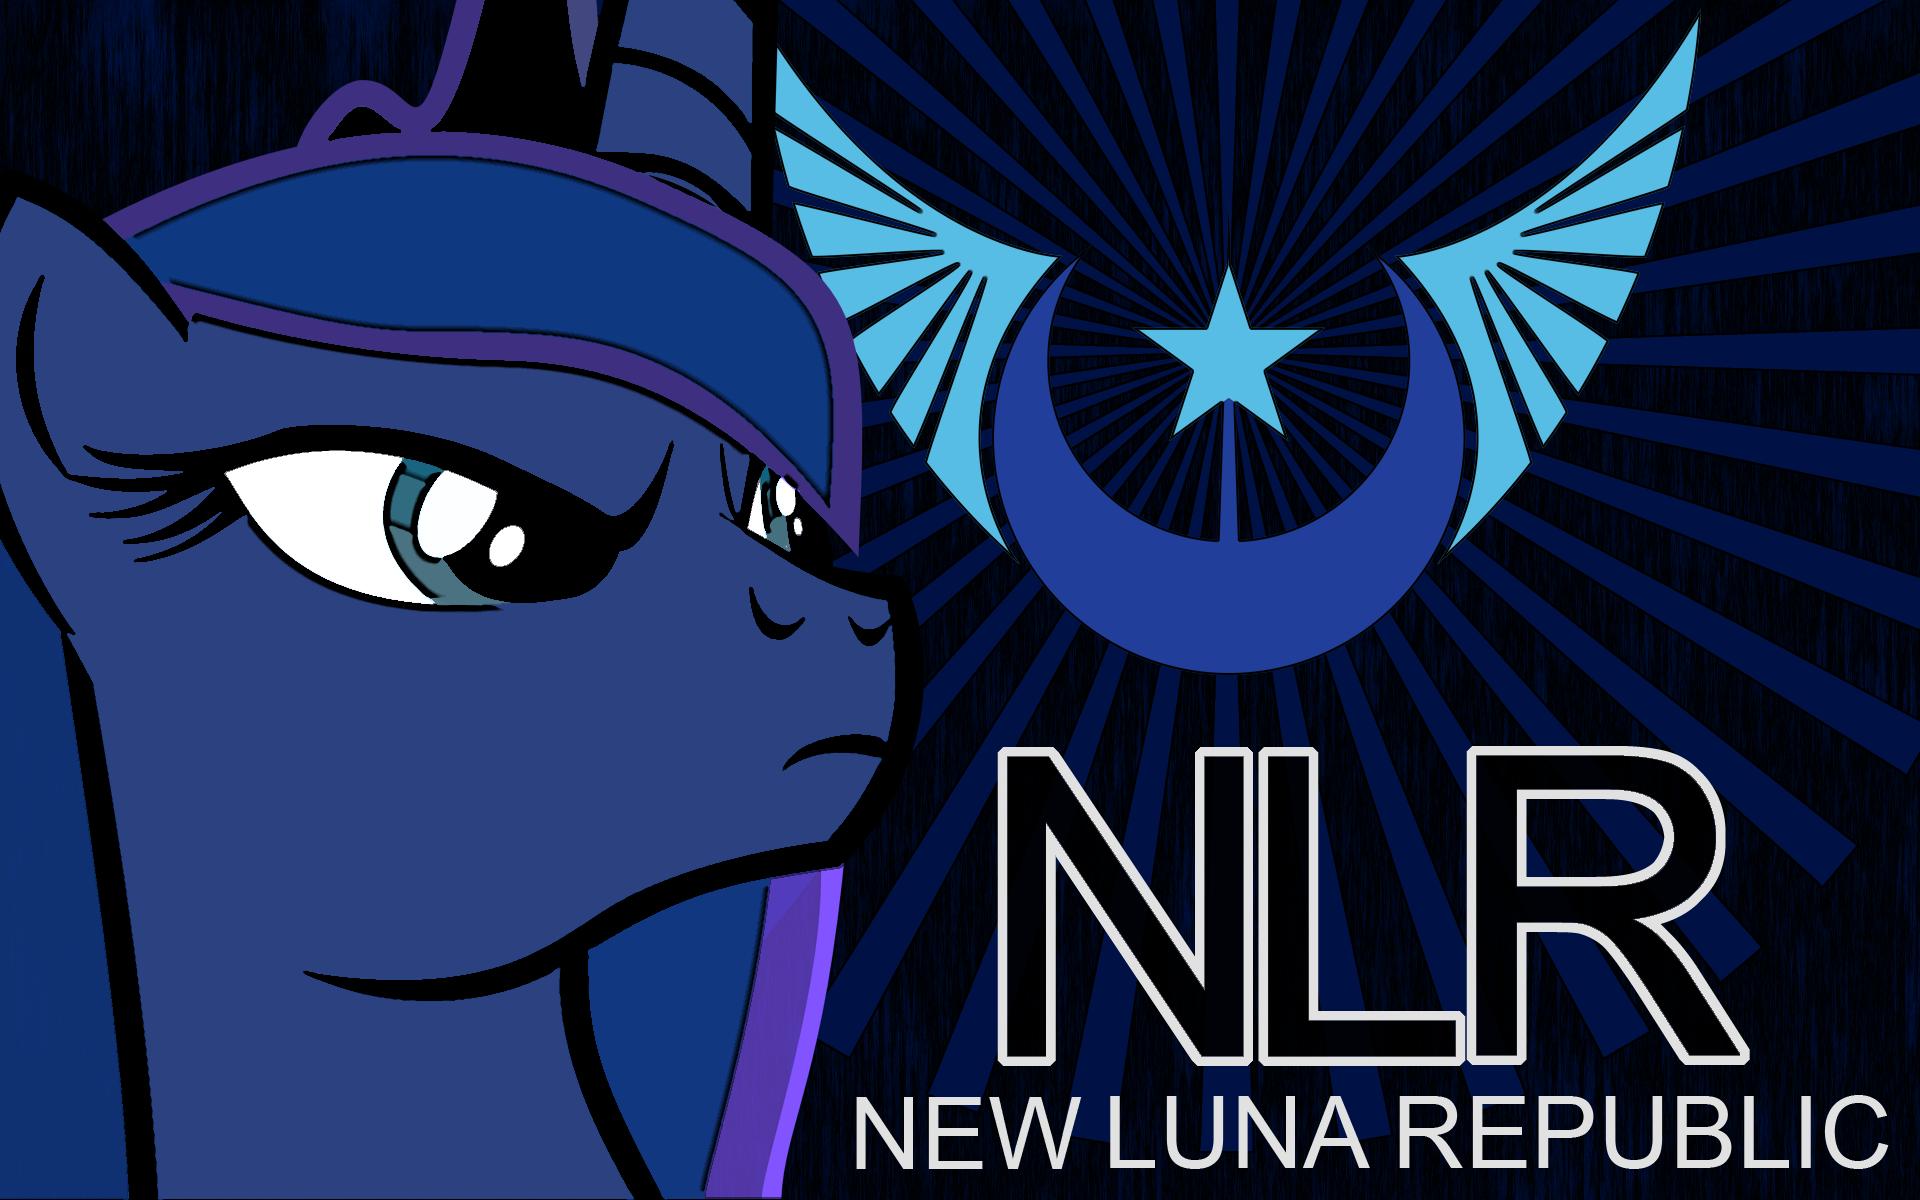 New Luna Republic Desktop Wallpaper (1900x1200) by AlphaMuppet, Emkay-MLP and kintexu2